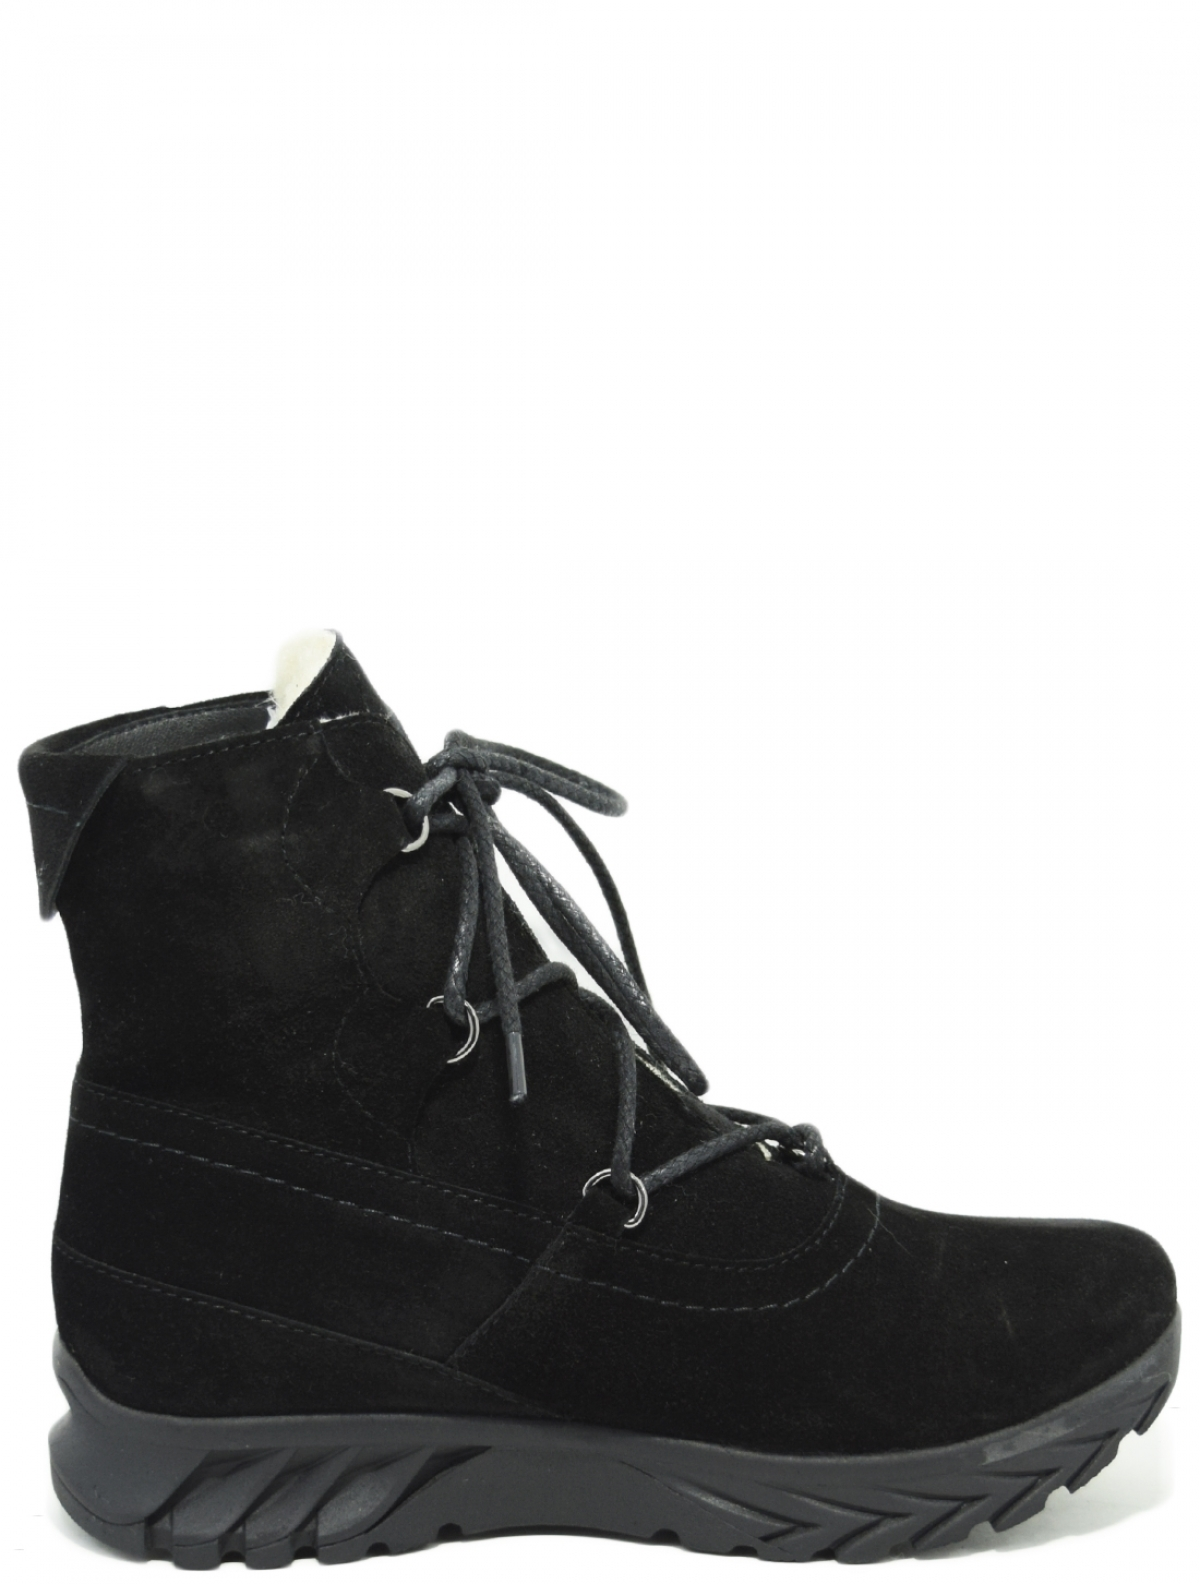 Selm 1925-4 женские ботинки